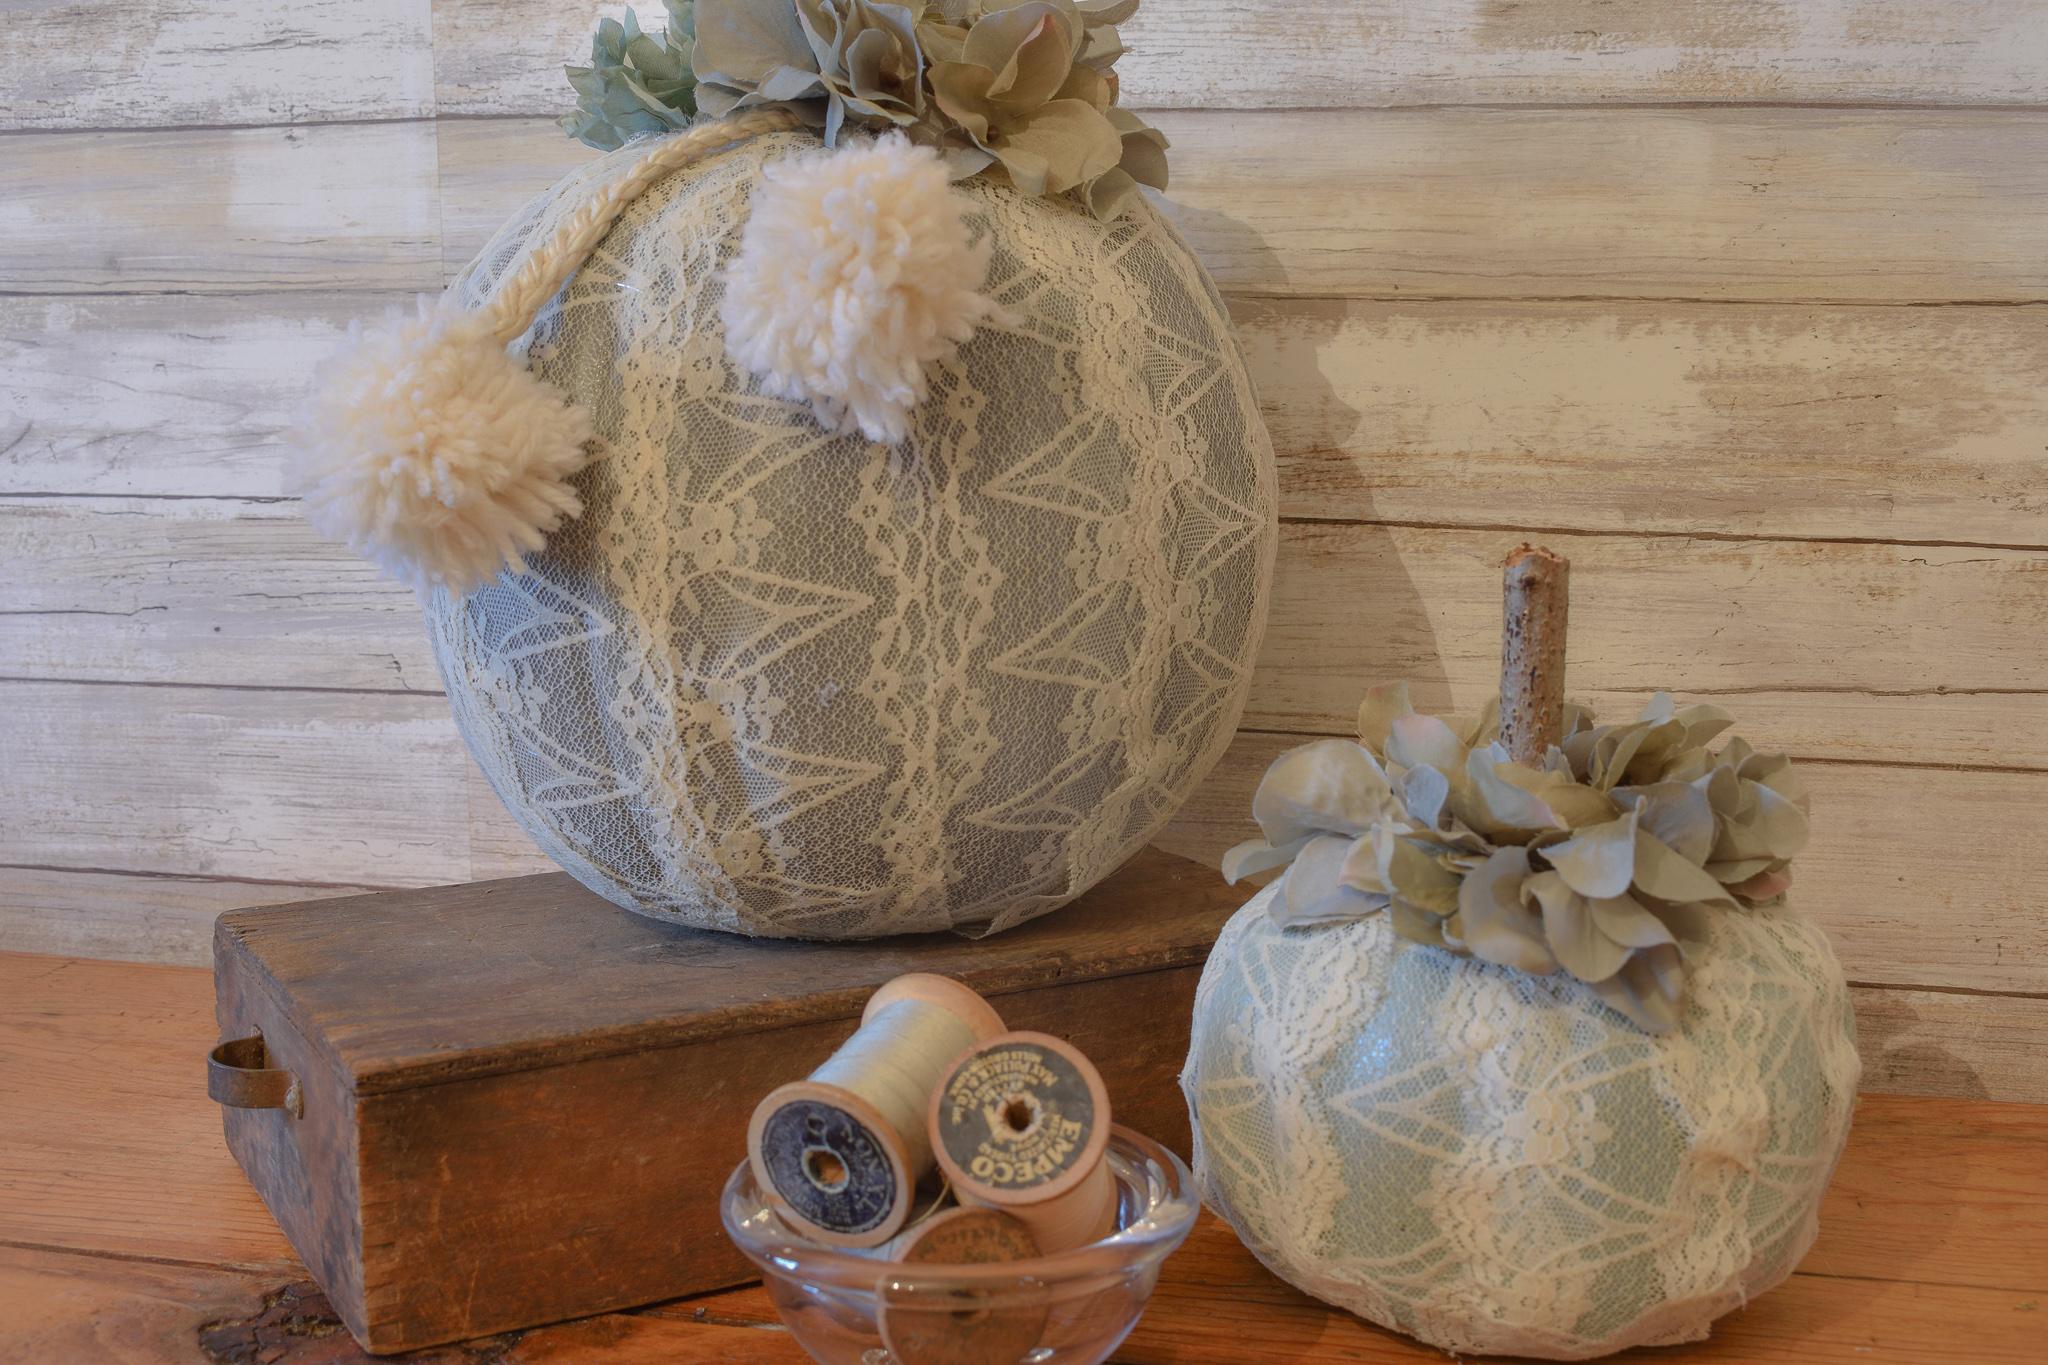 DIY Lace Pumpkins | zucchinisisters.com - DIY Lace Pumpkins made with Dollar Tree carvable pumpkins, chalk mineral paint, lace, Mod Podge, hot glue and silk florals. #zucchinisisters #dollartreedecor #lacepumpkins #falldecor